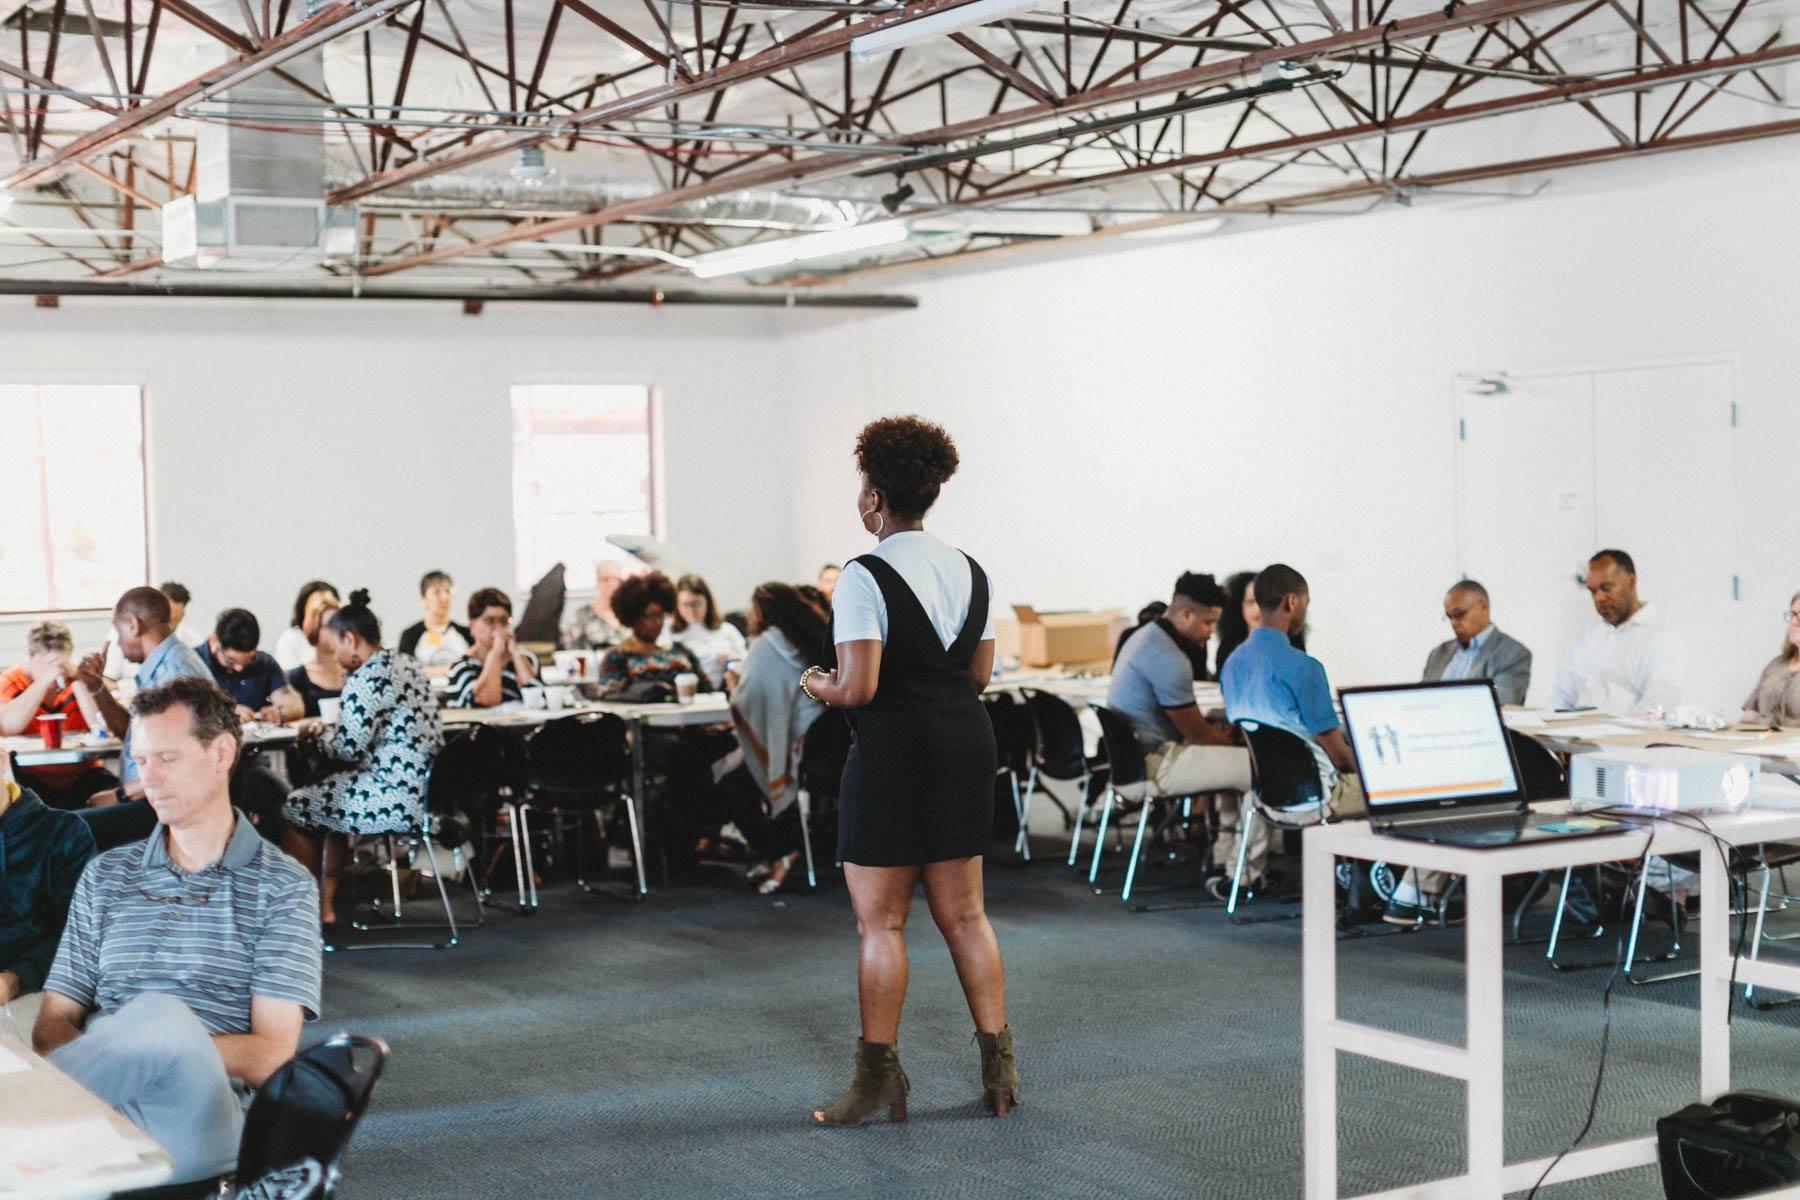 Dallas City of Learning: Neighborhood Resource Initiative